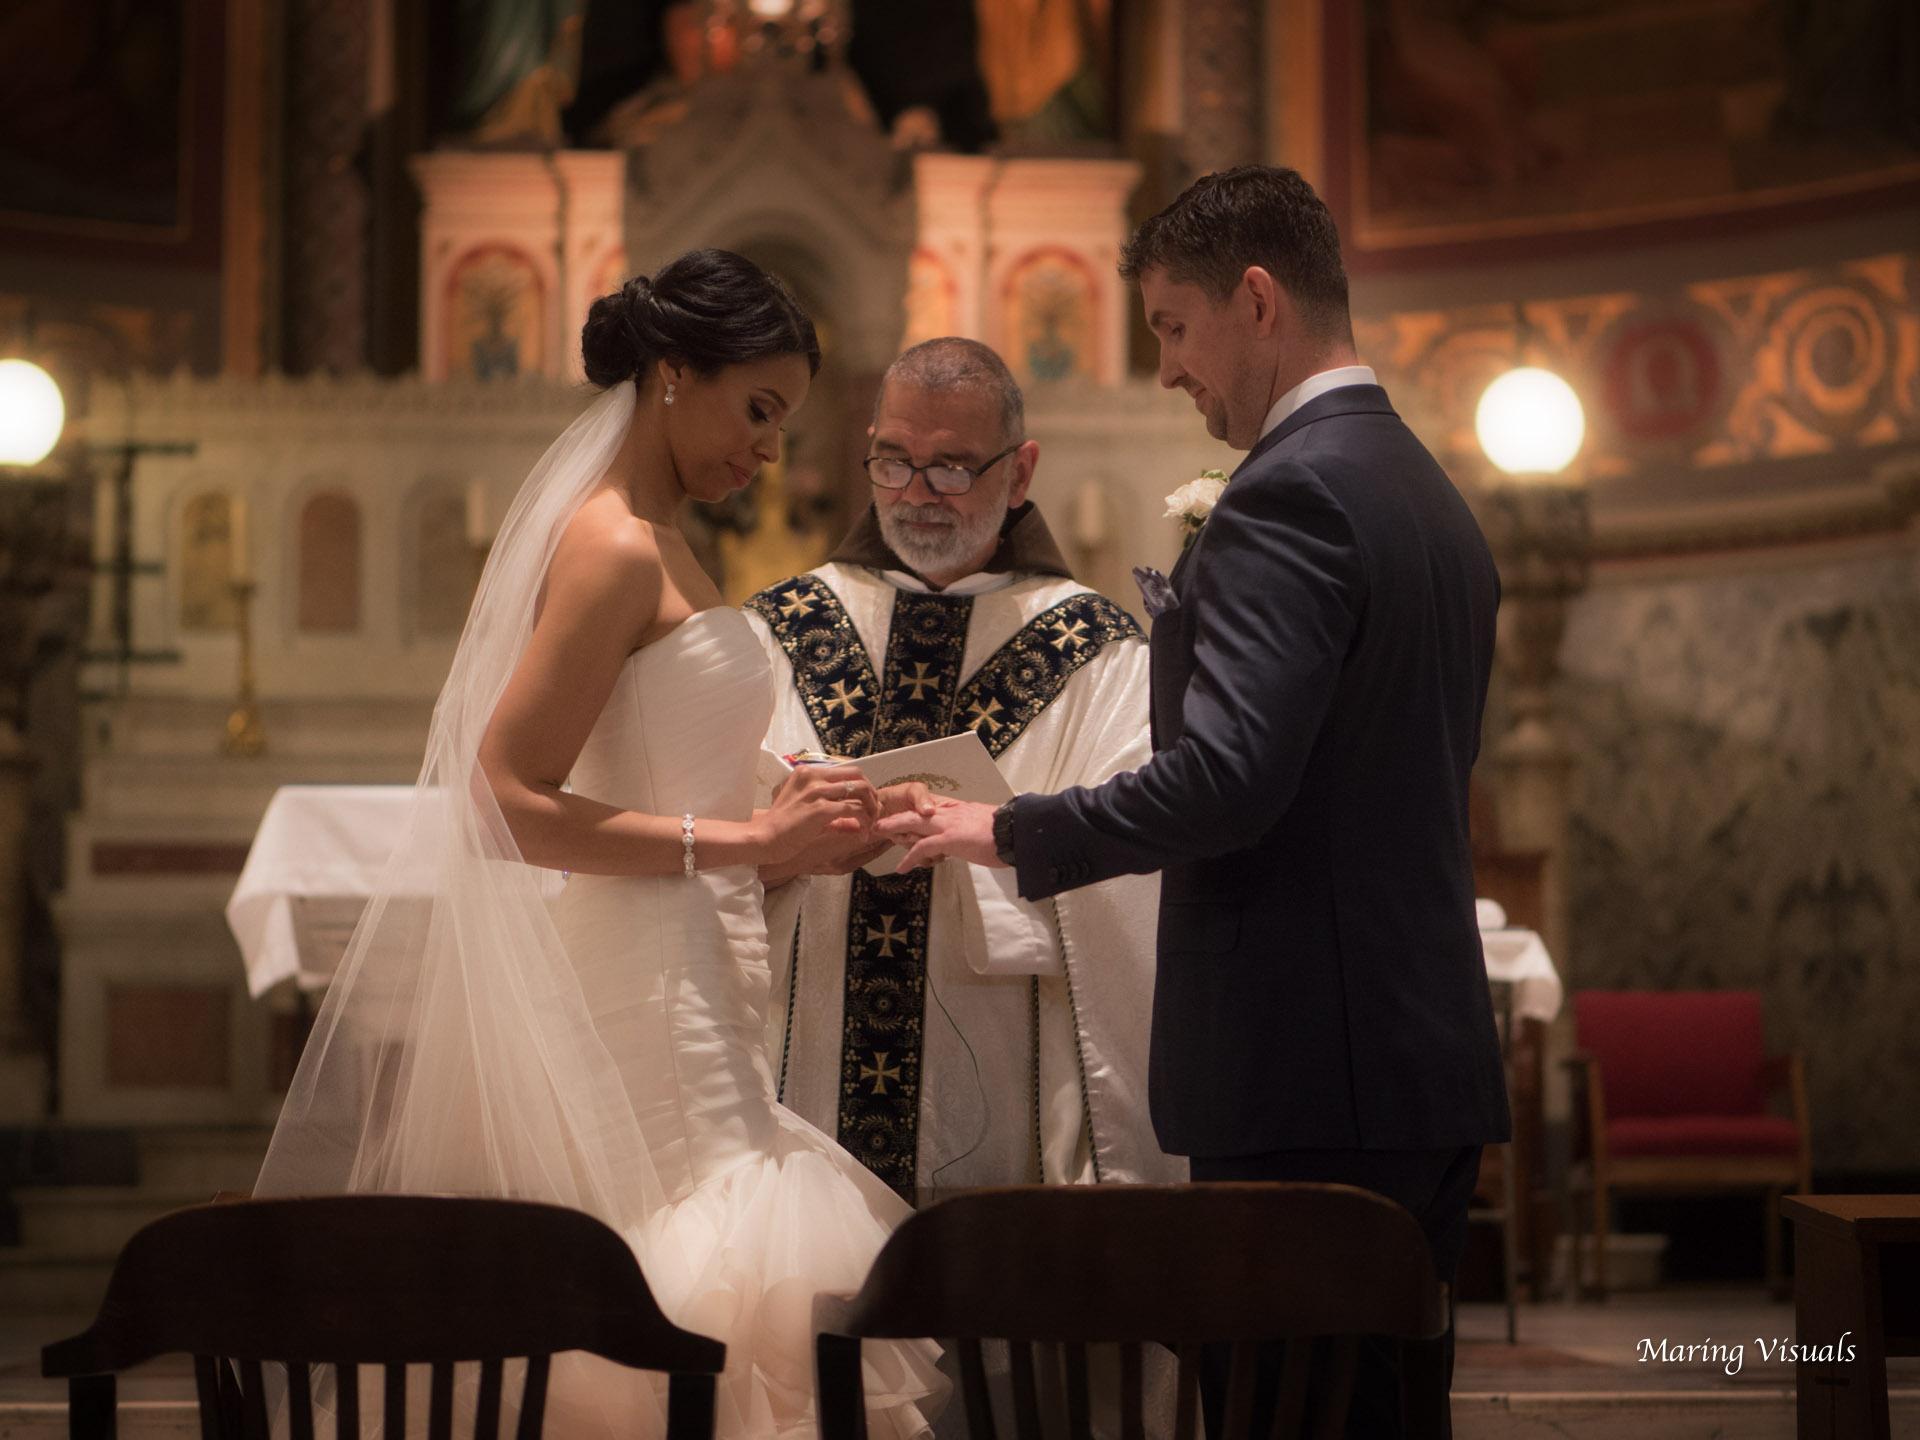 Photos by NYC Wedding Photographers Maring Visuals